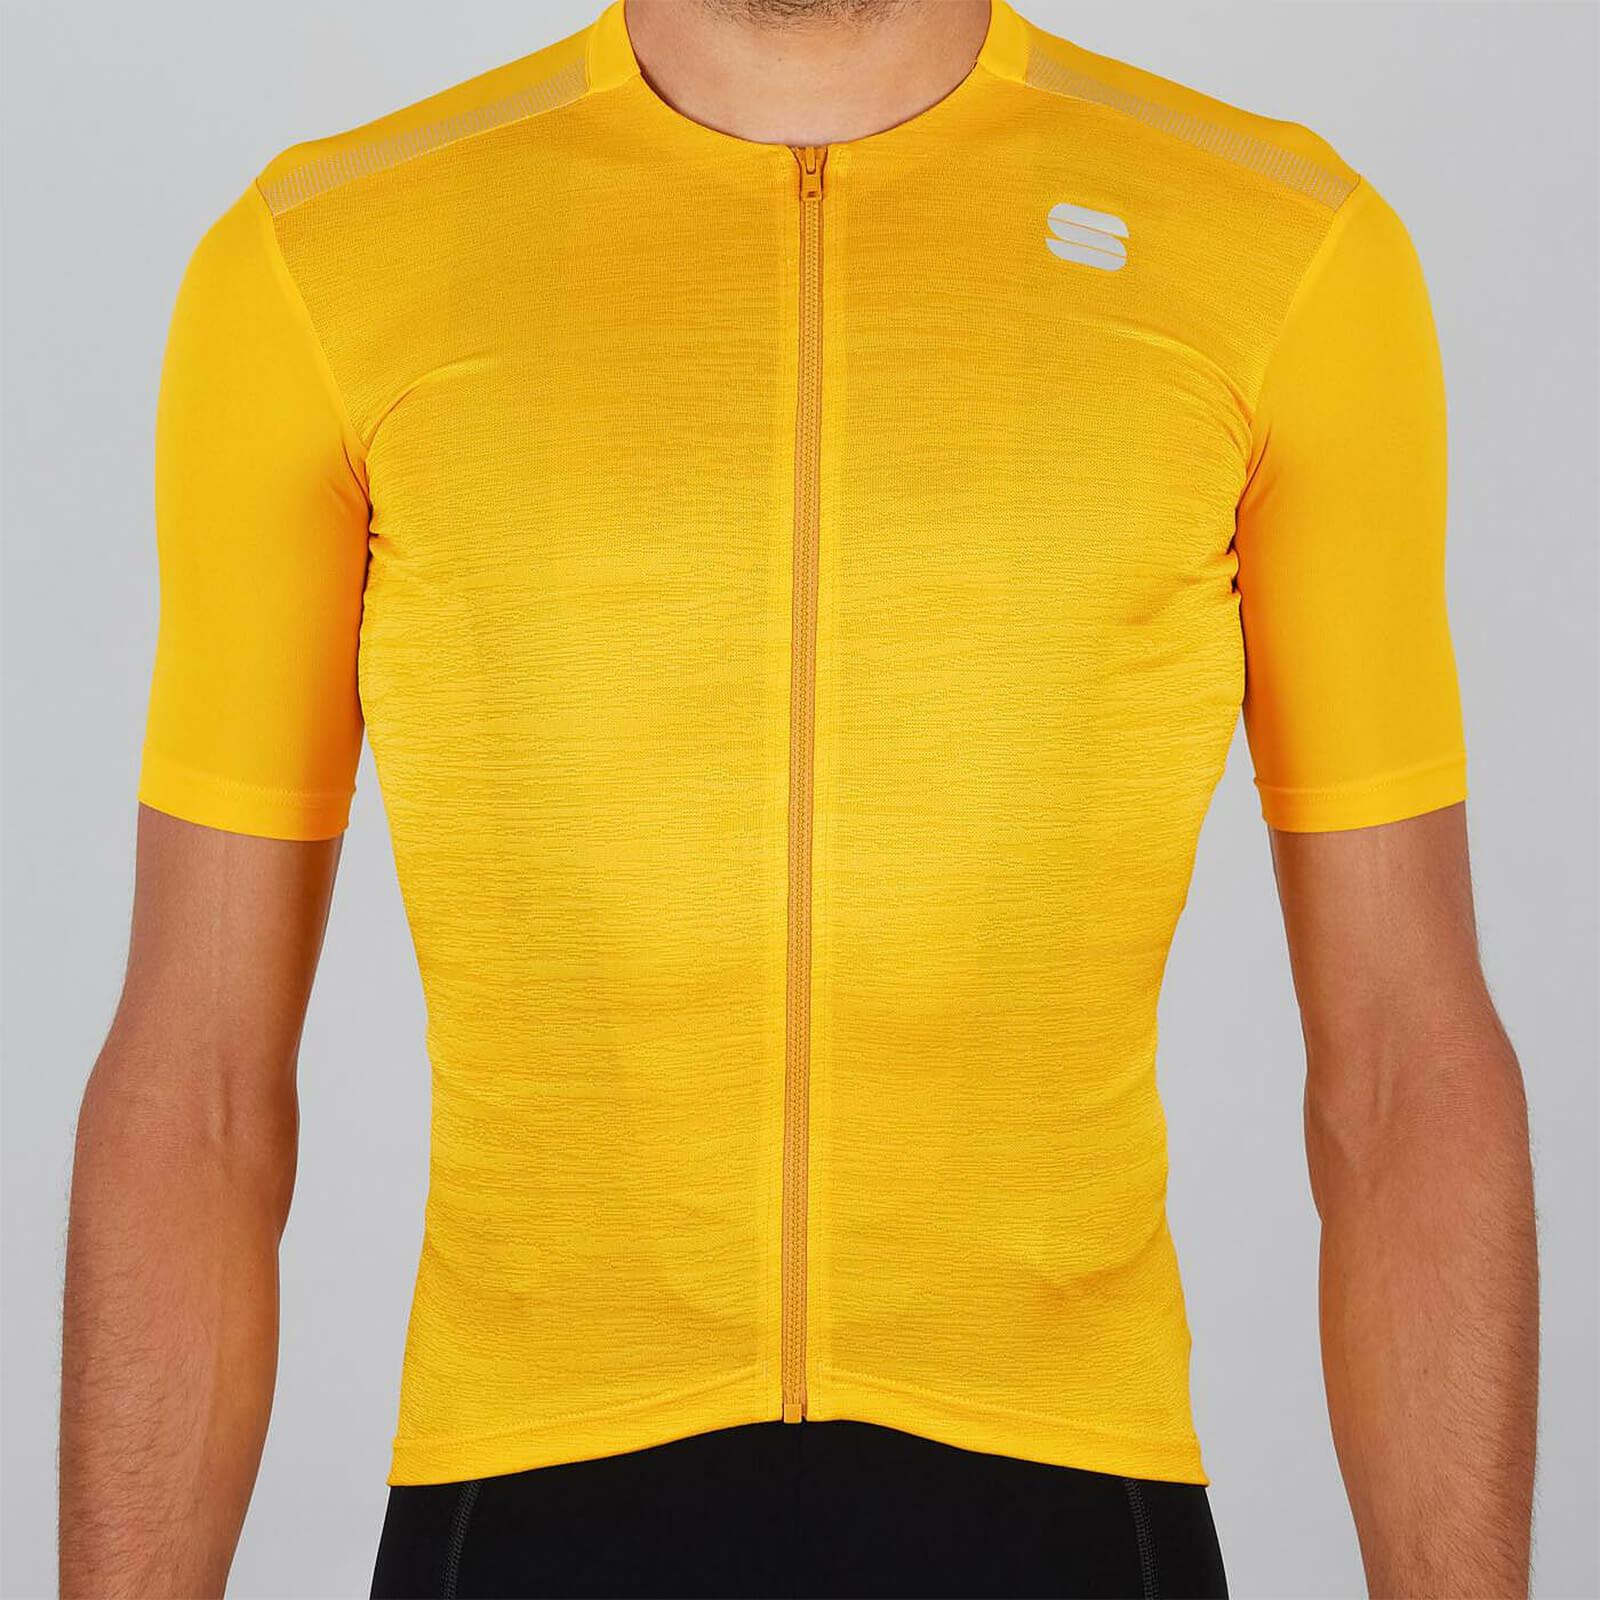 Sportful Supergiara Jersey - XXL - Yellow